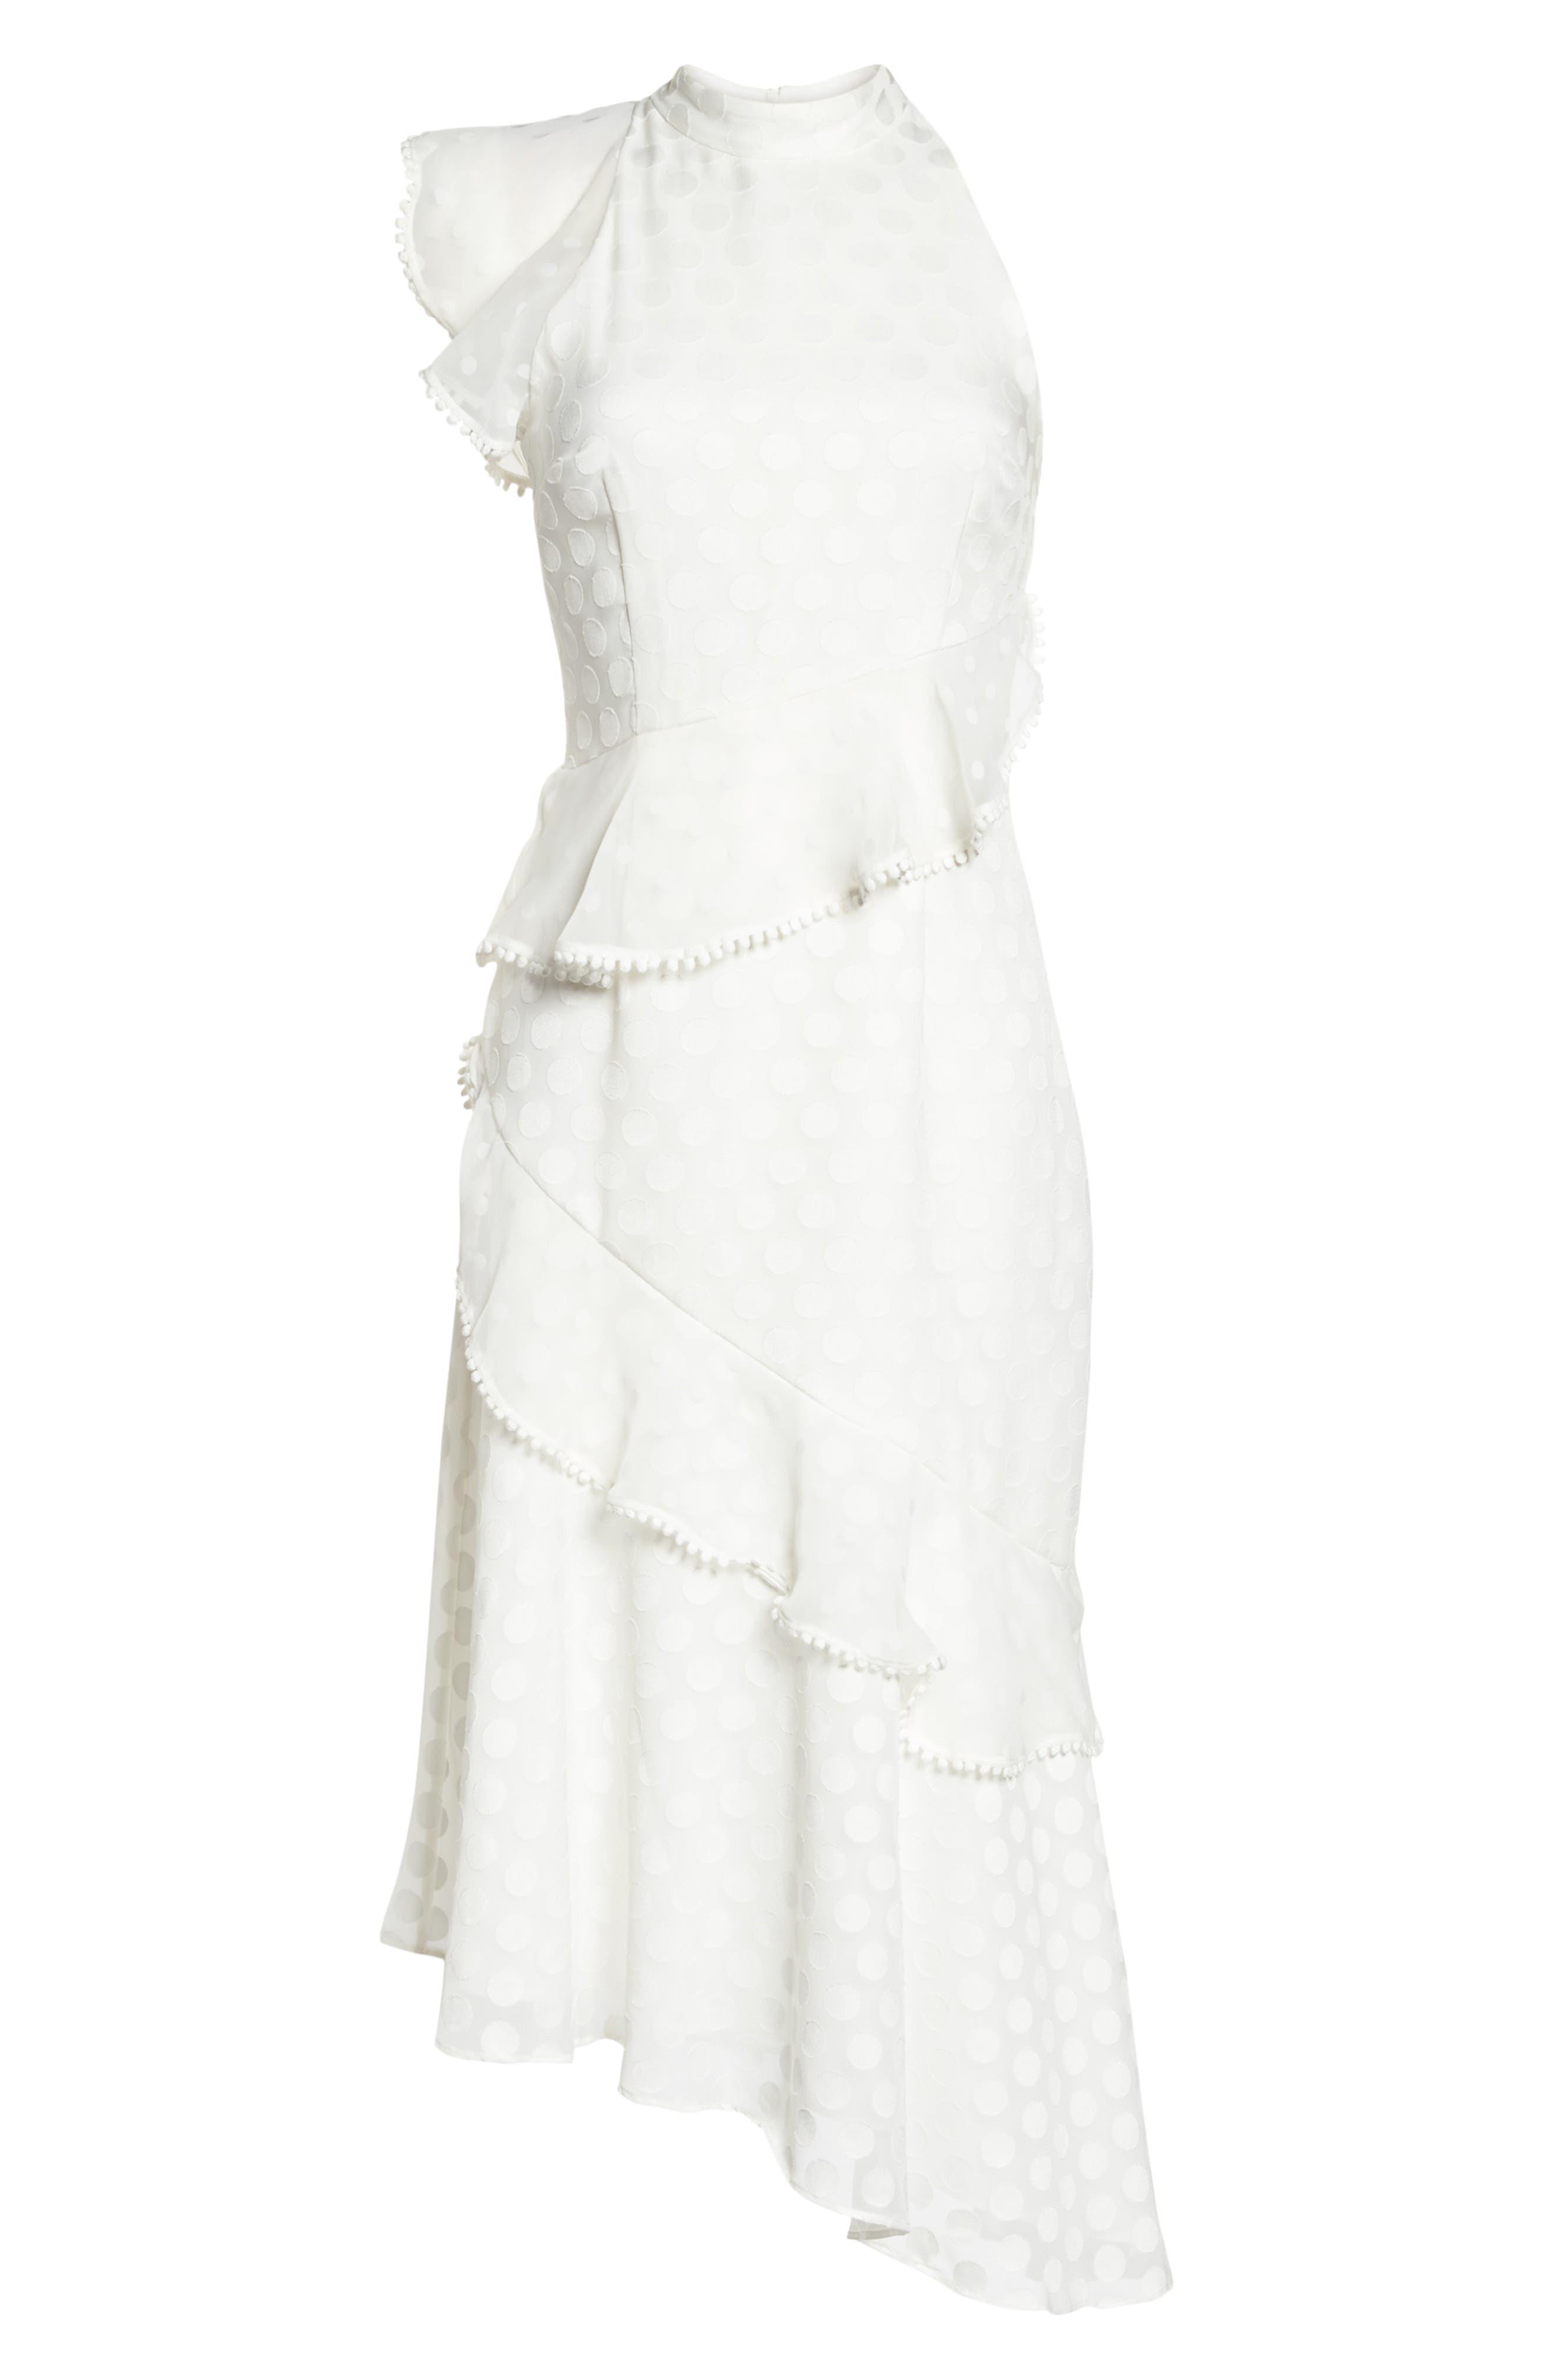 See You Now Polka Dot Midi Dress,                             Alternate thumbnail 6, color,                             Ivory